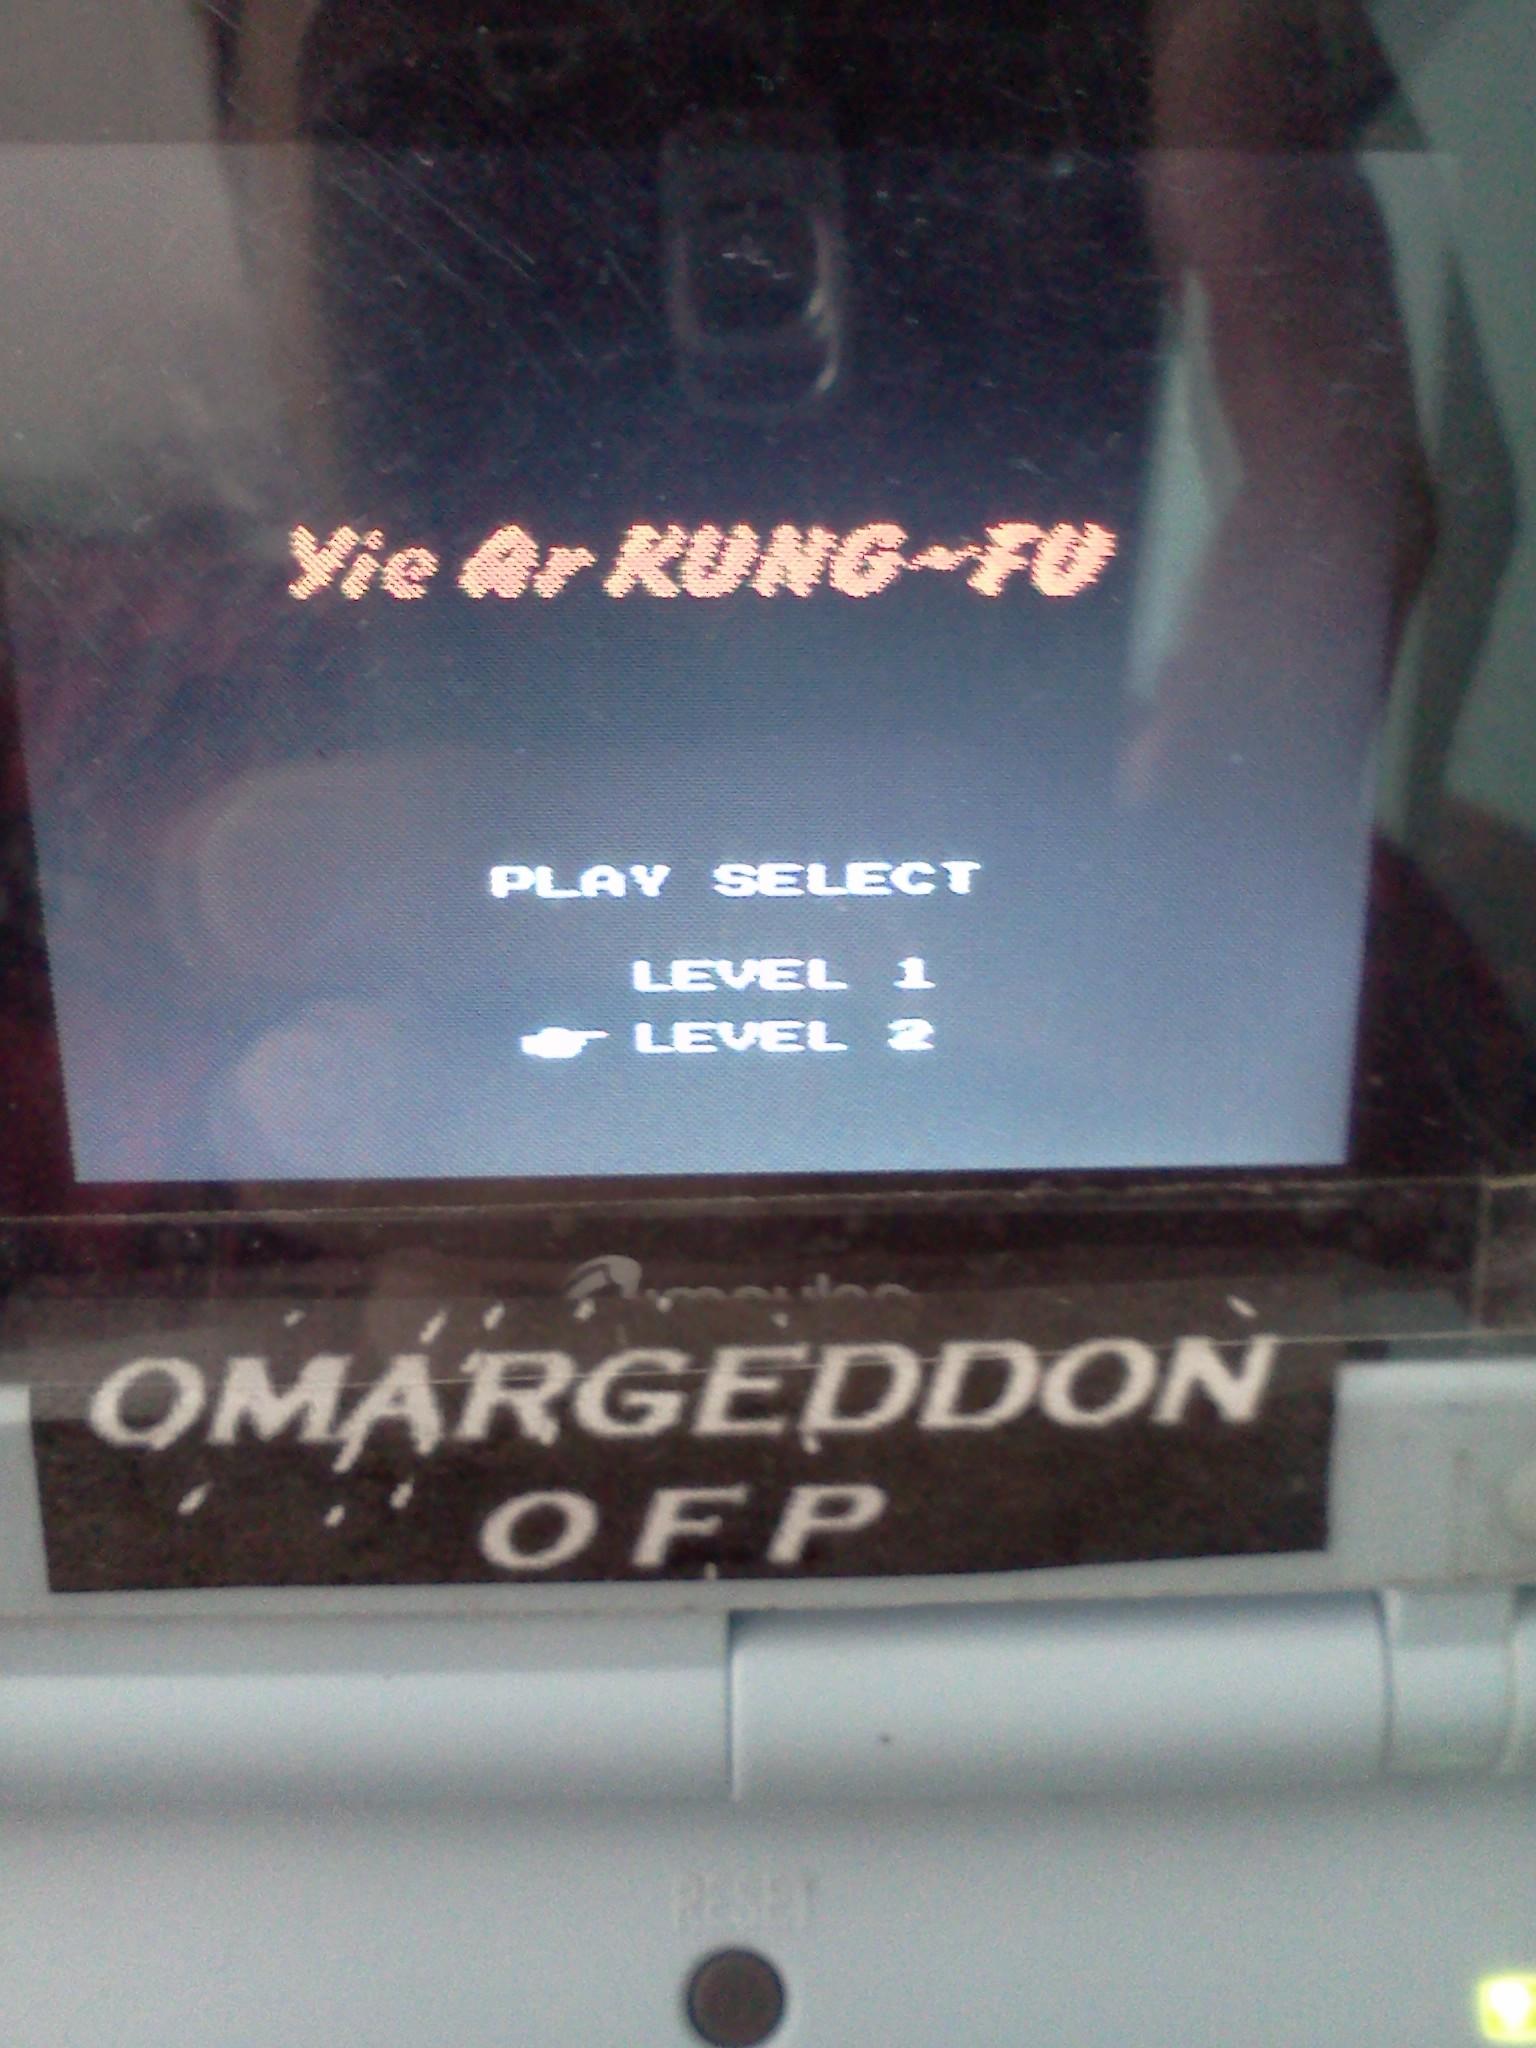 Yie Ar Kung Fu [Level 2] 88,100 points